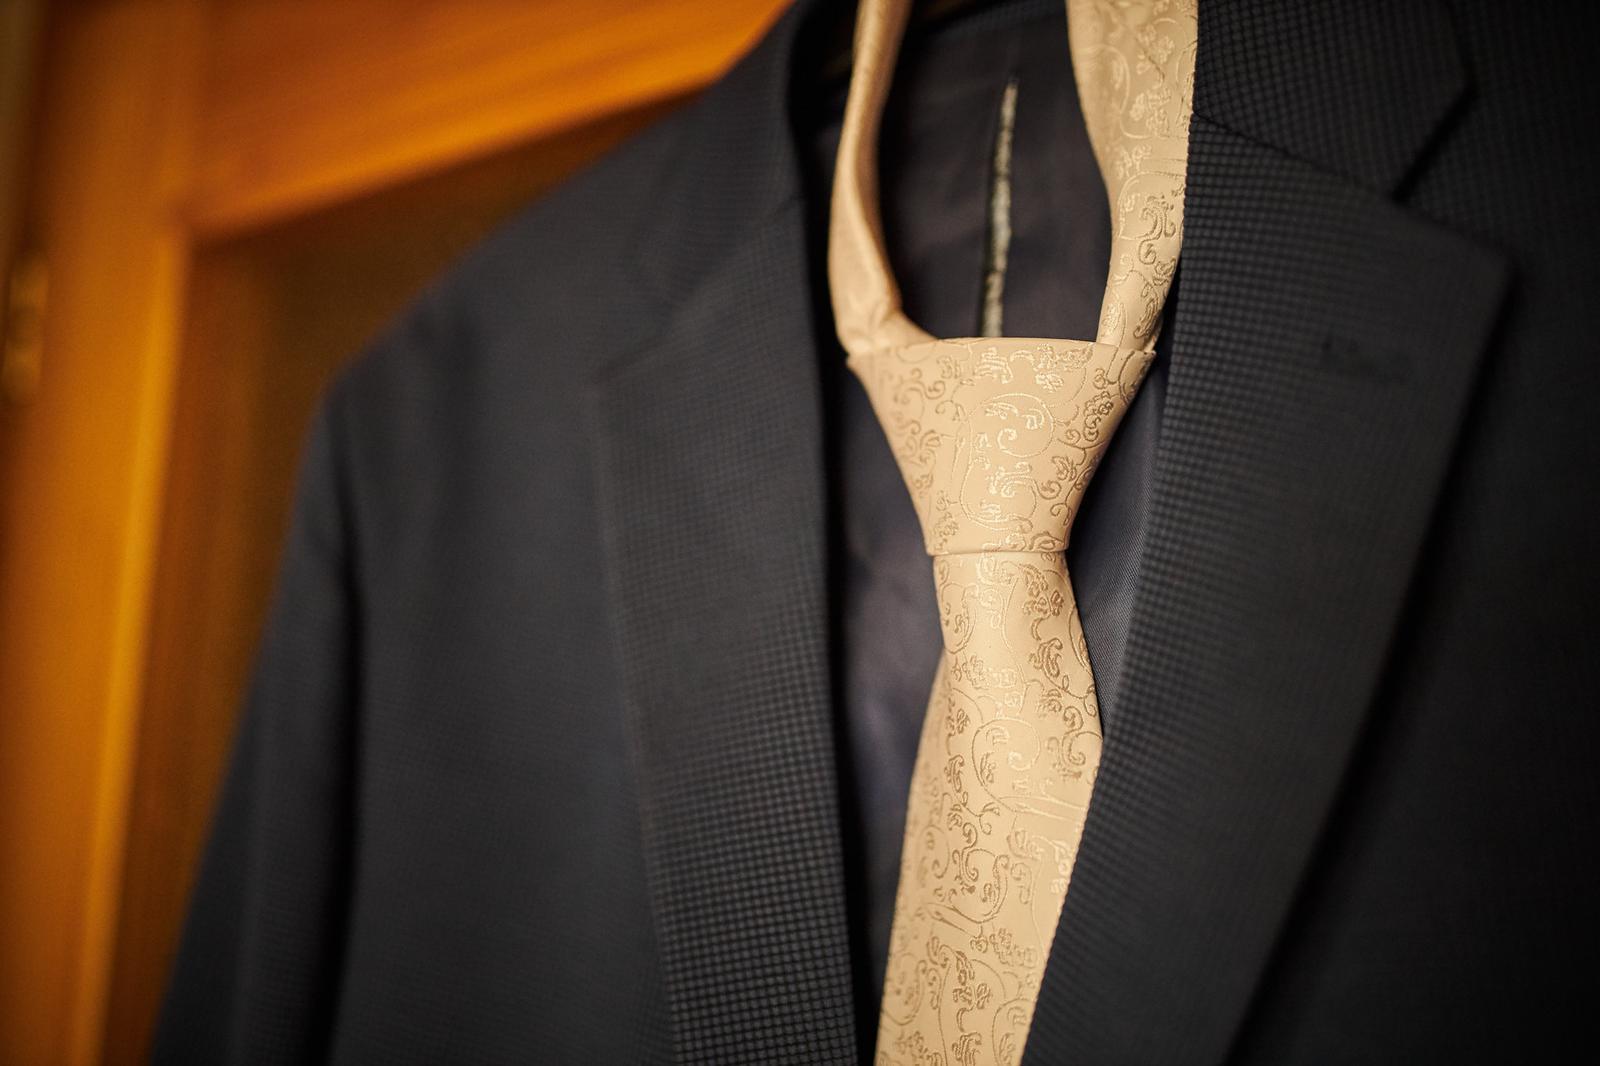 kravata a satka pre zenicha - Obrázok č. 1